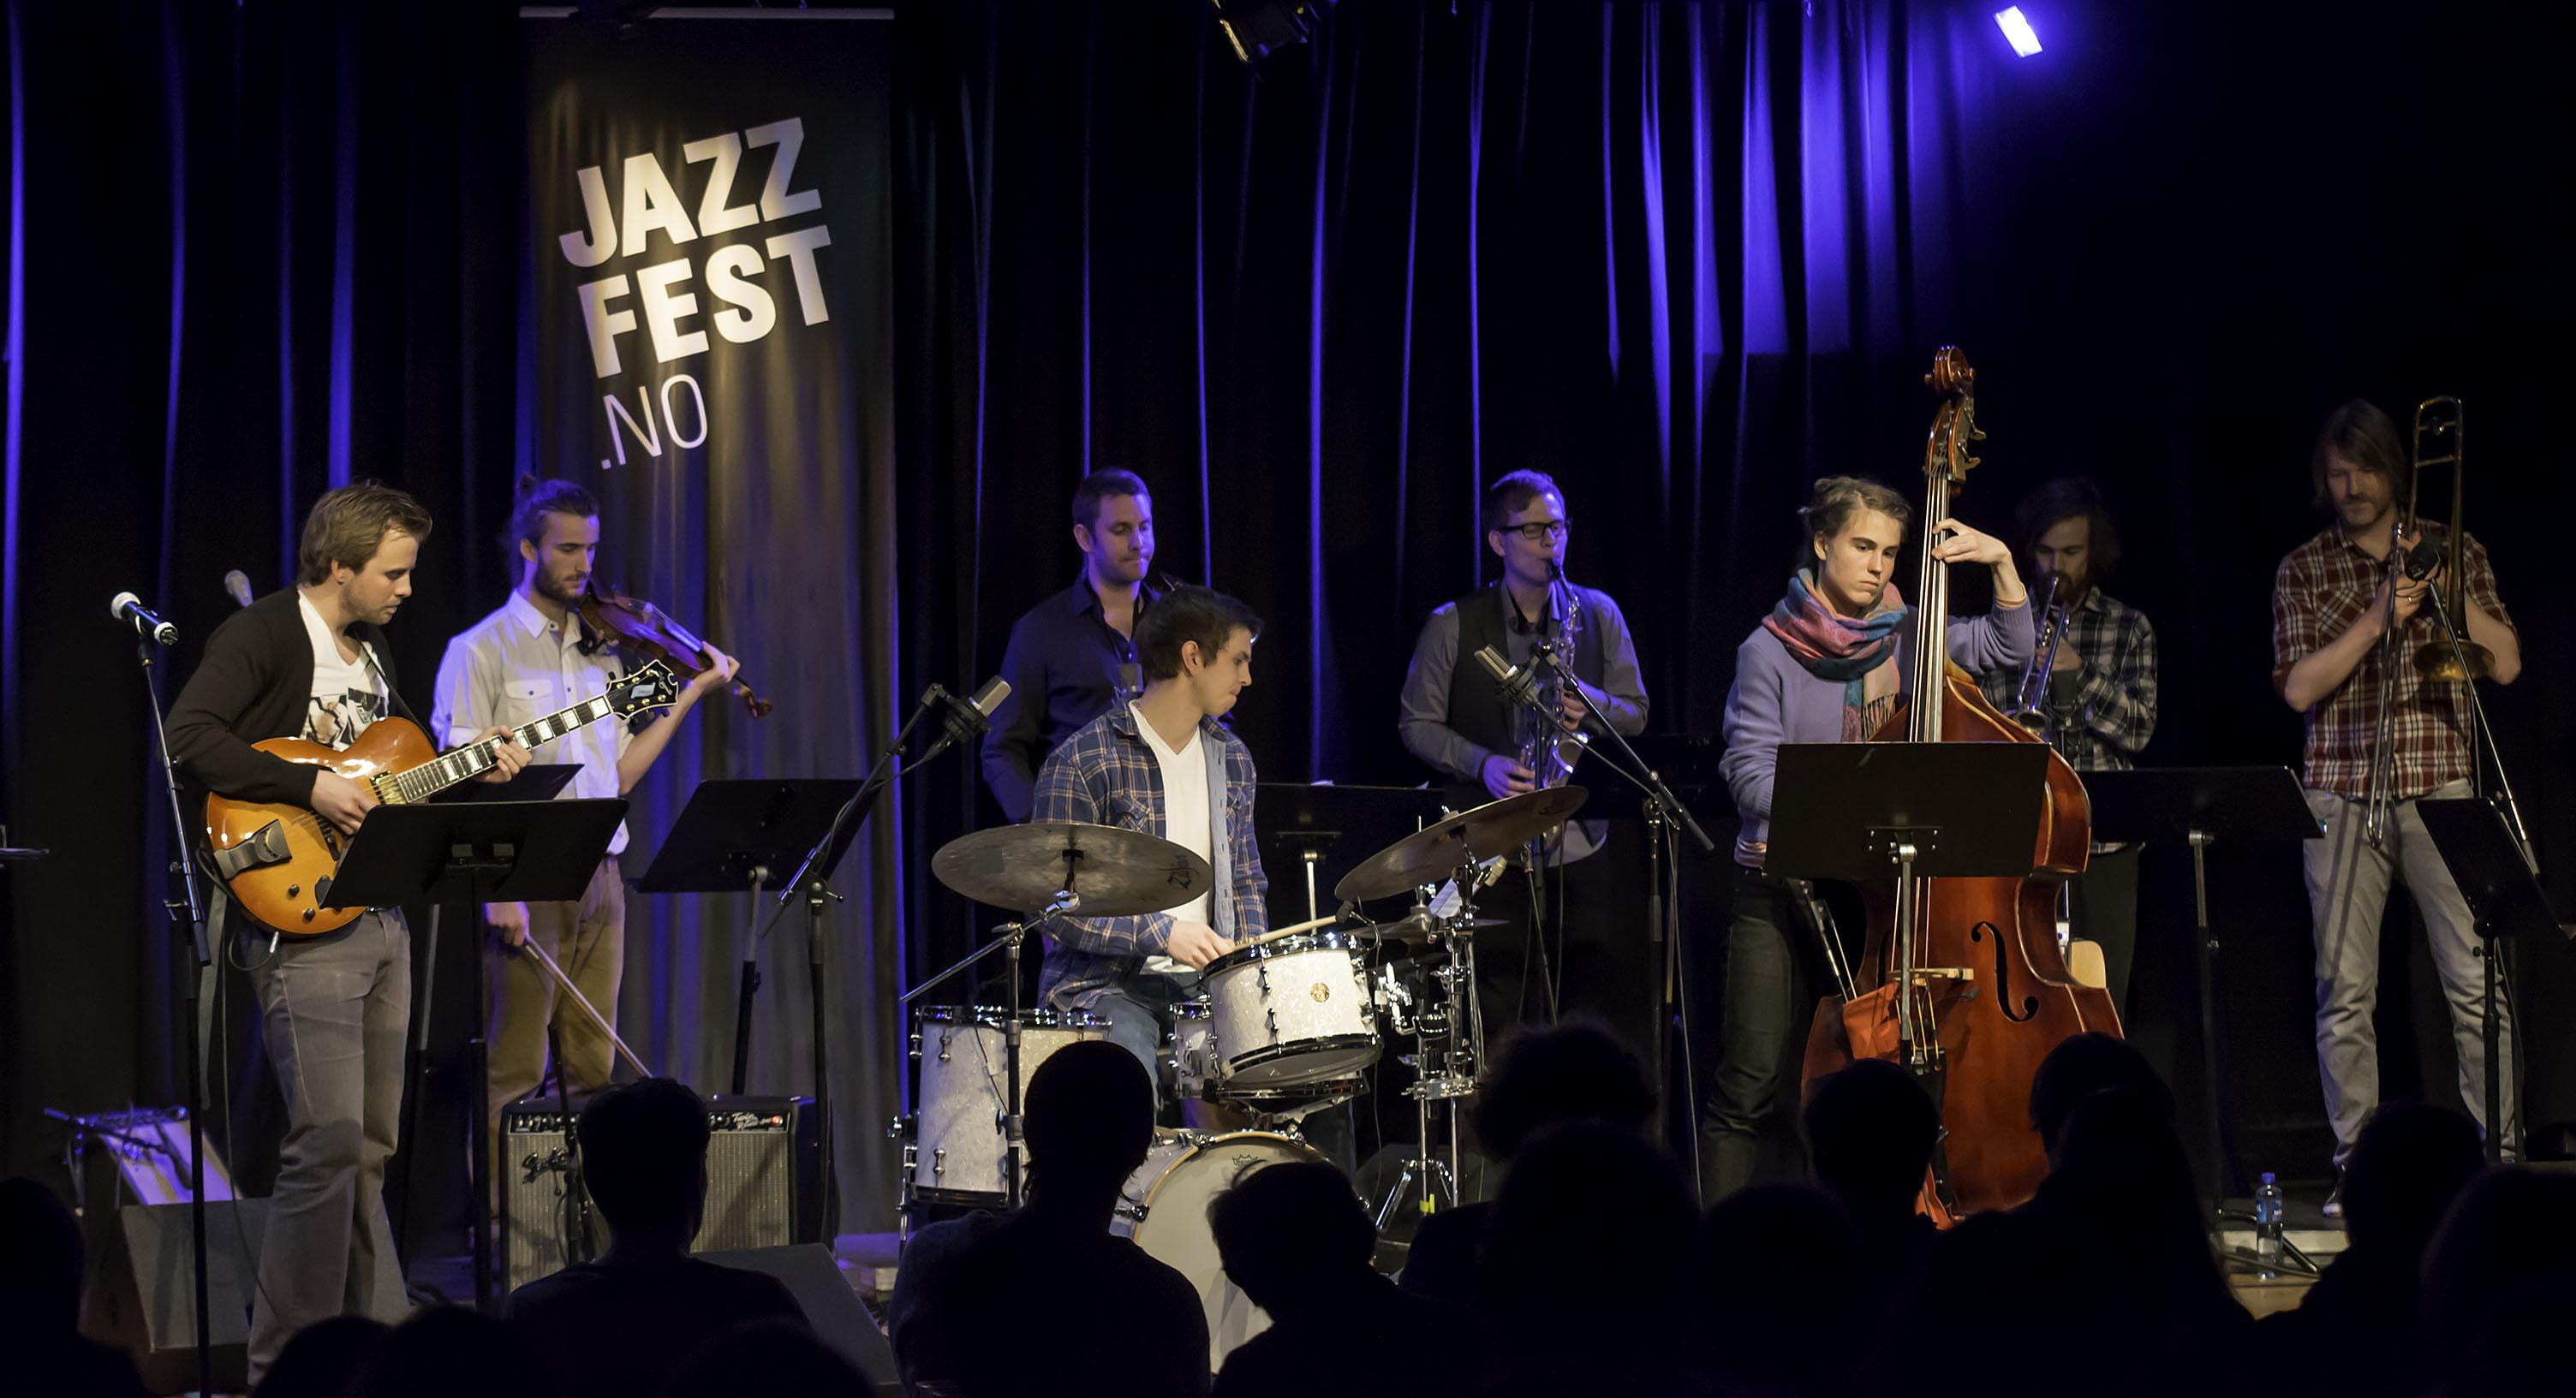 Jazz Students Go Difference, 2012 Trondheim Jazz Festival